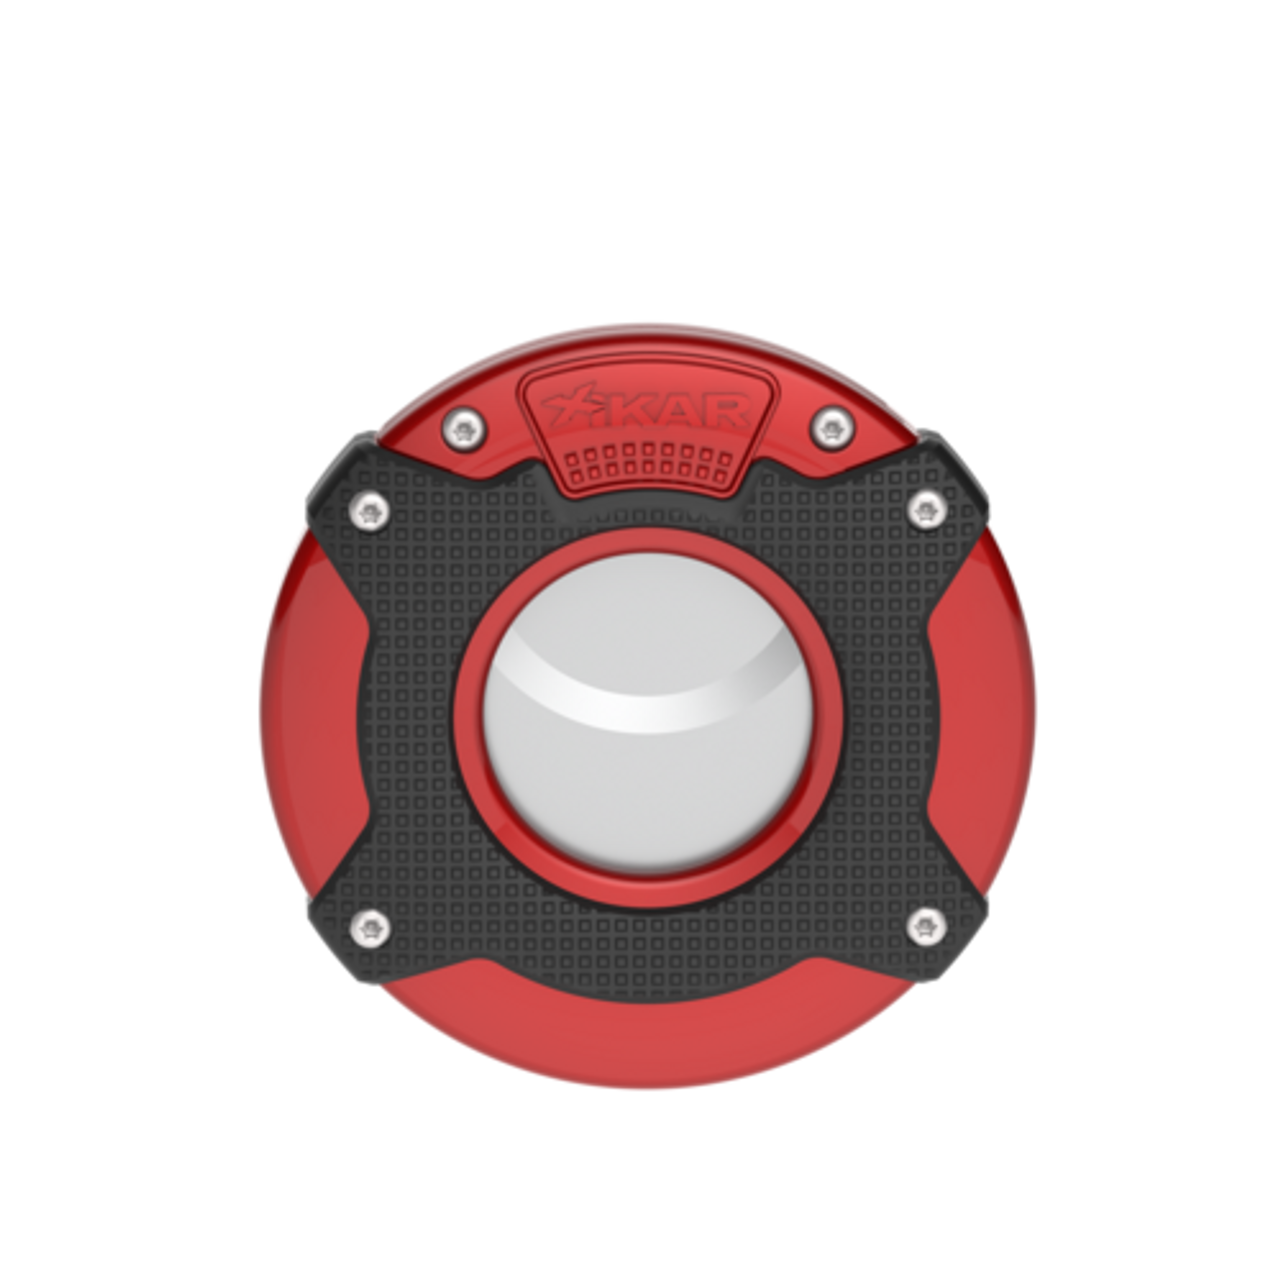 Xikar Enso - Red